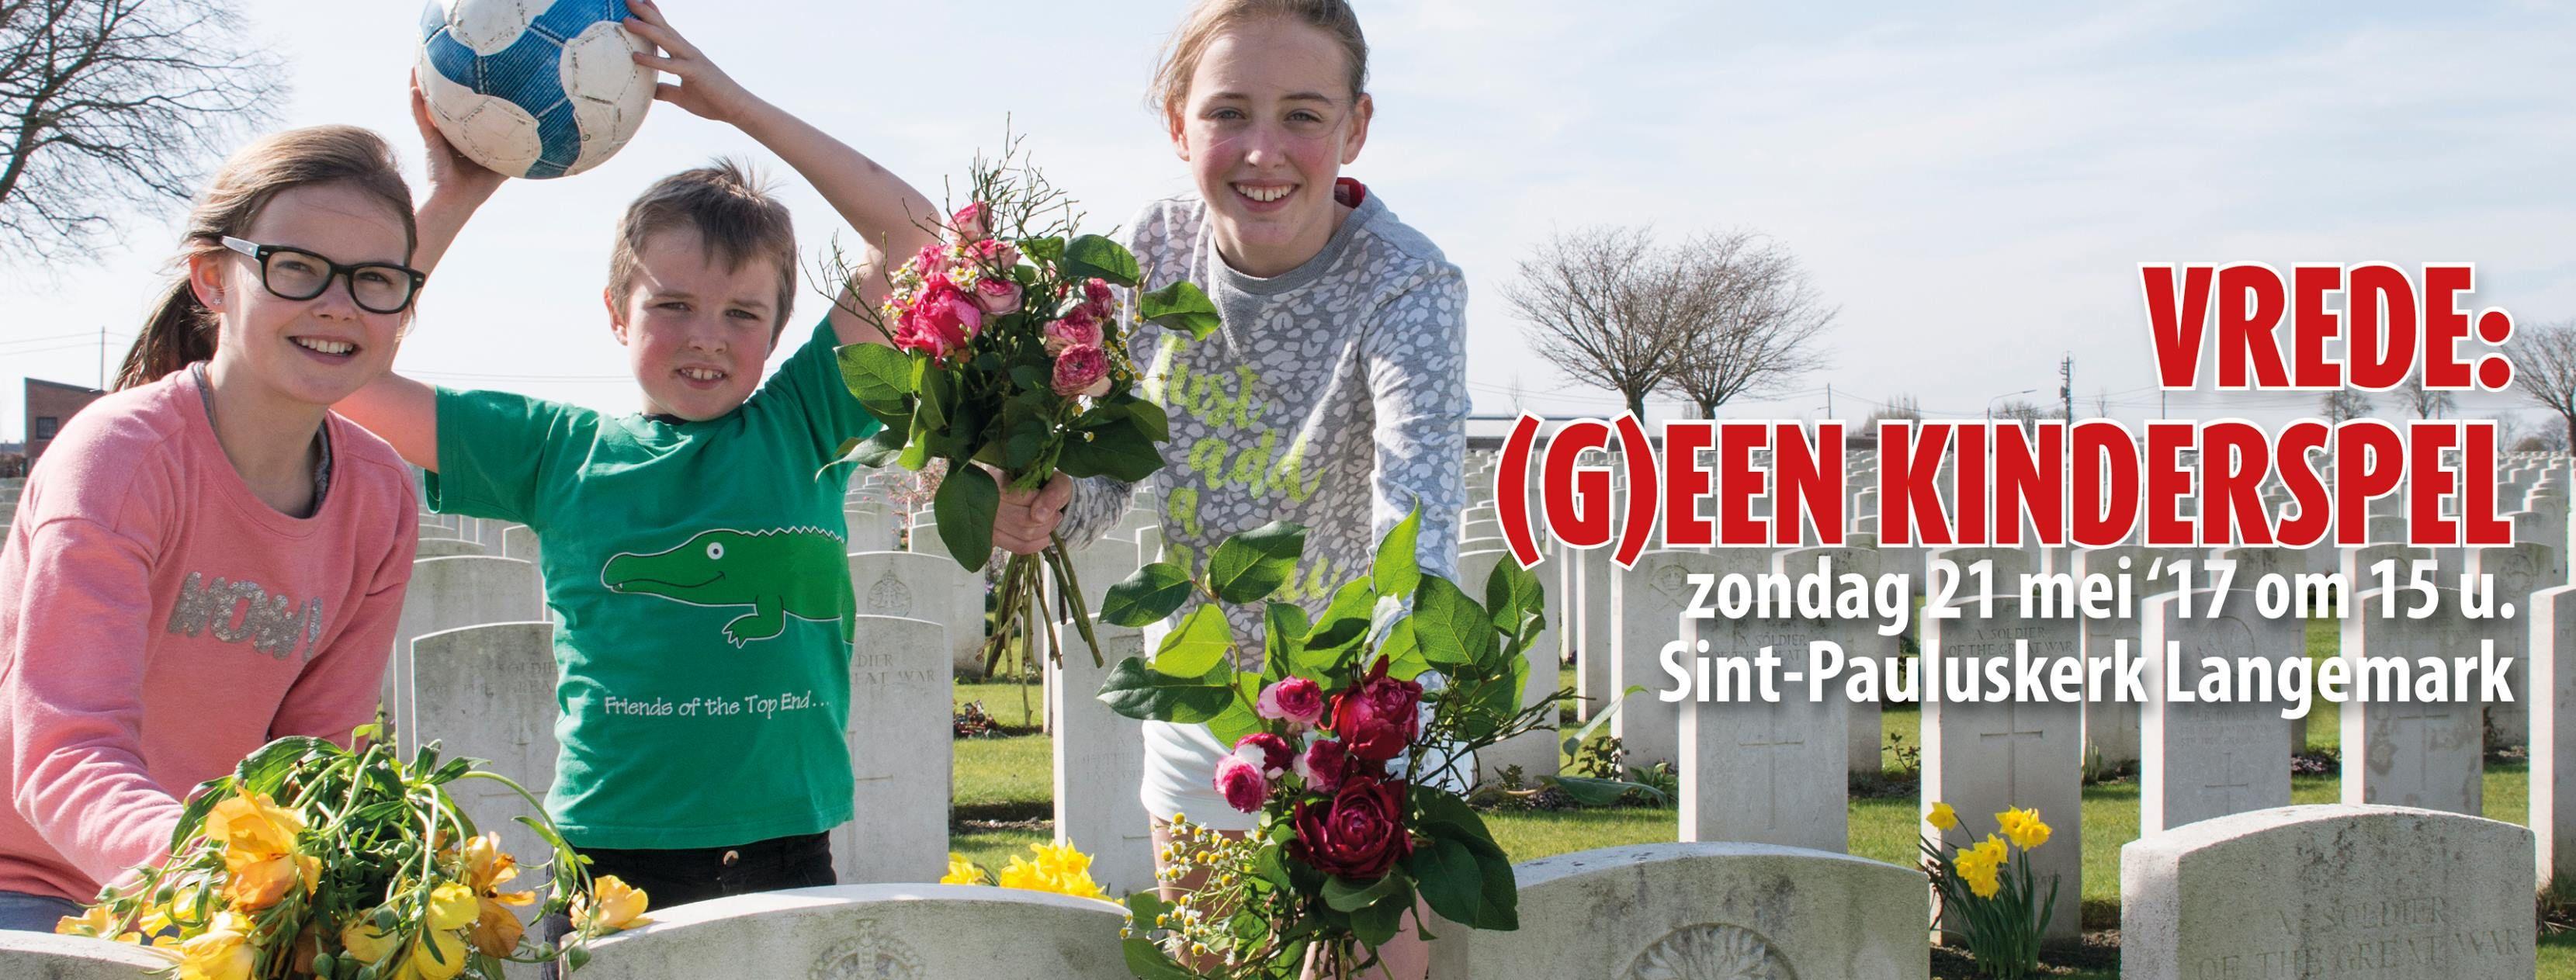 Vredeswake Langemark - Vrede:(g)een kinderspel